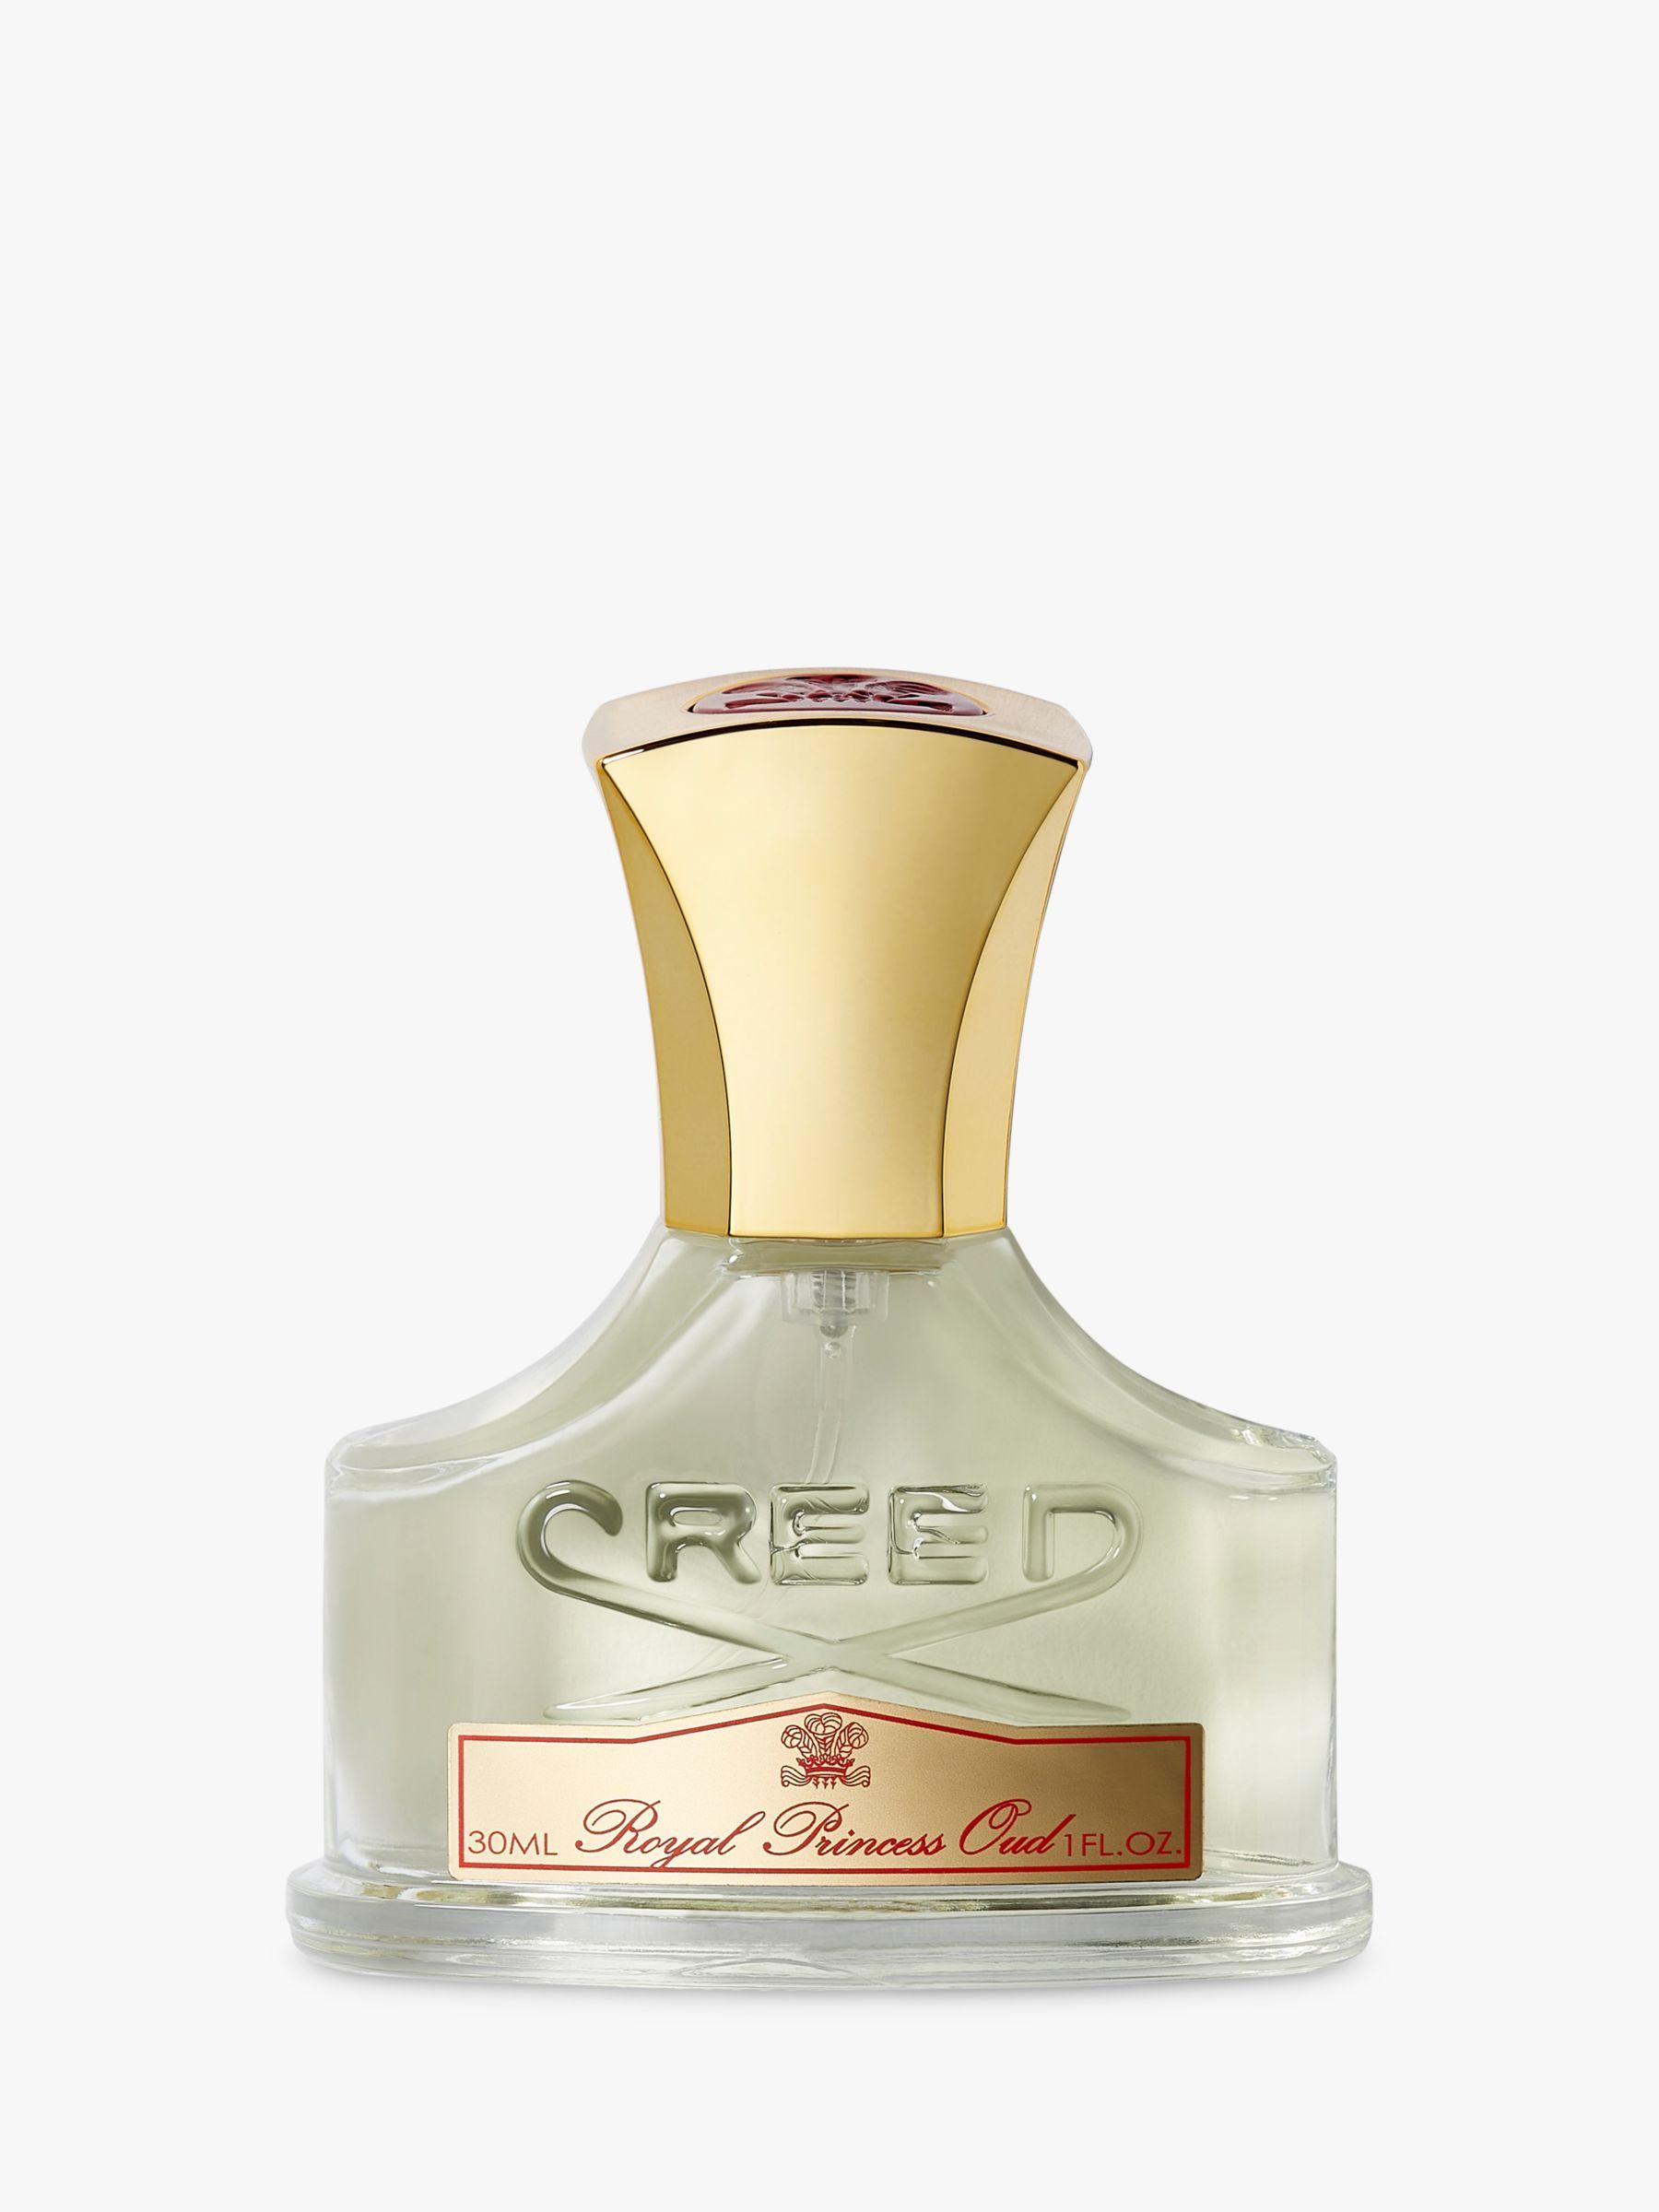 Creed CREED Royal Princess Oud Eau de Parfum, 30ml